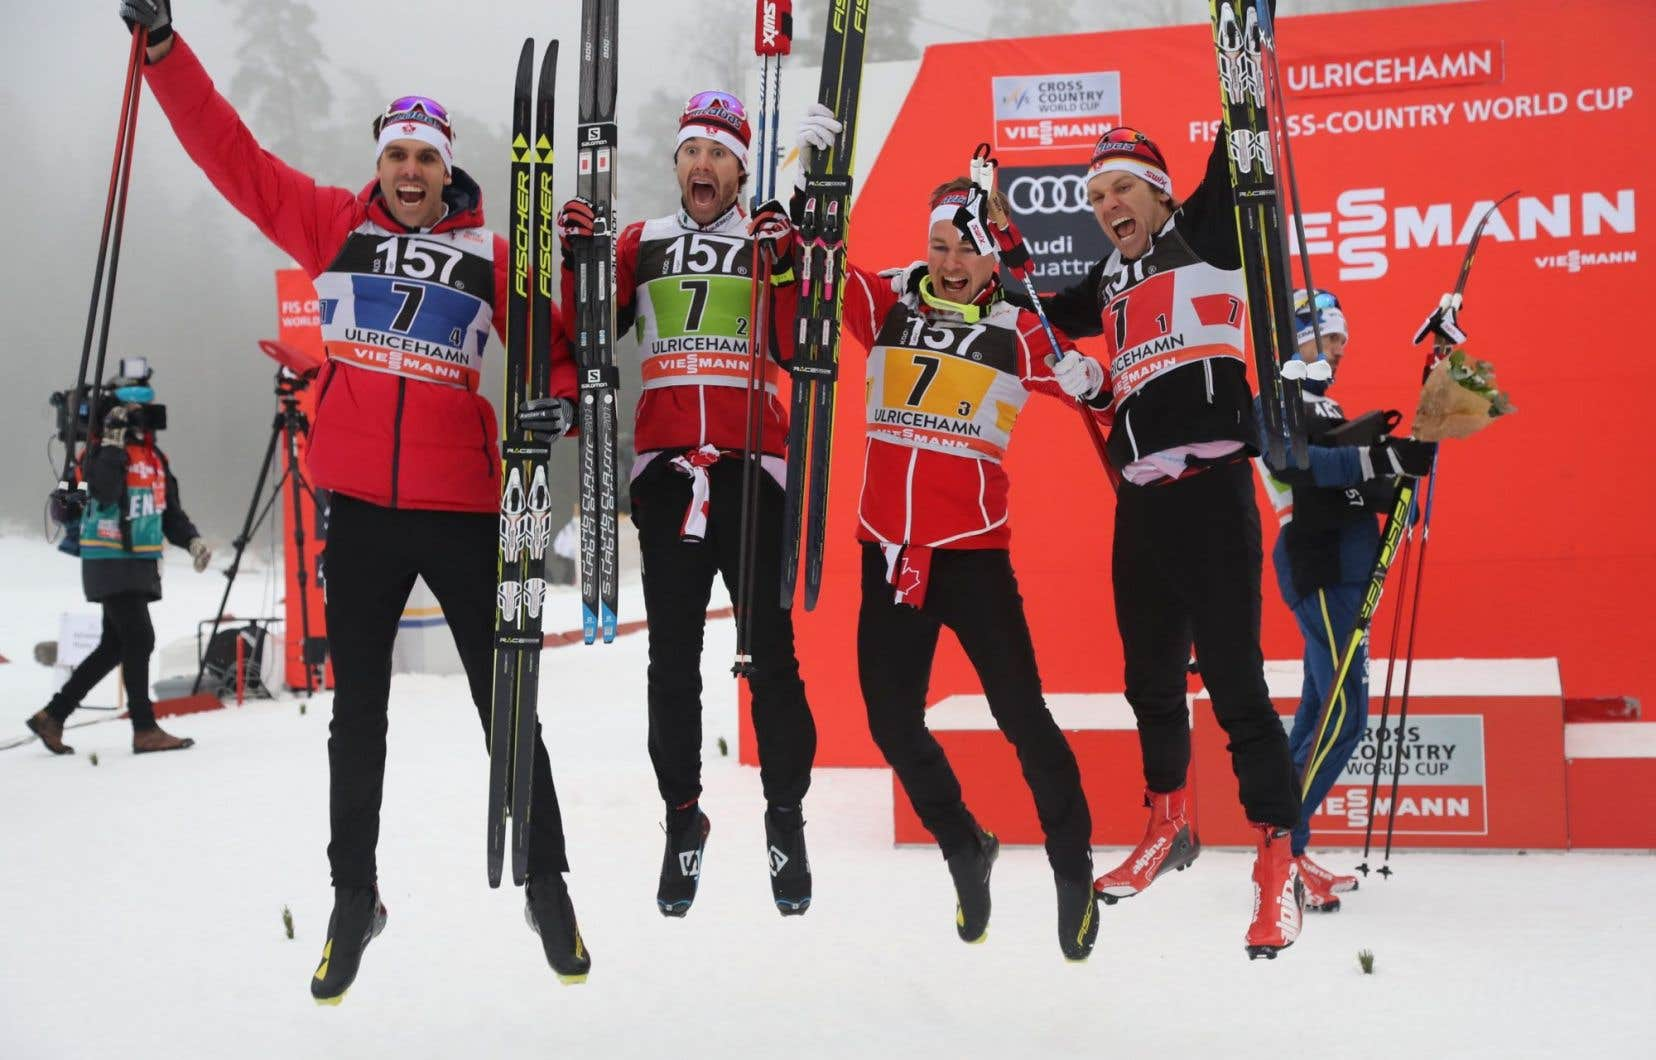 L'équipe canadienne:Len Valjas, Alex Harvey, Knute Johnsgaard et Devon Kershaw